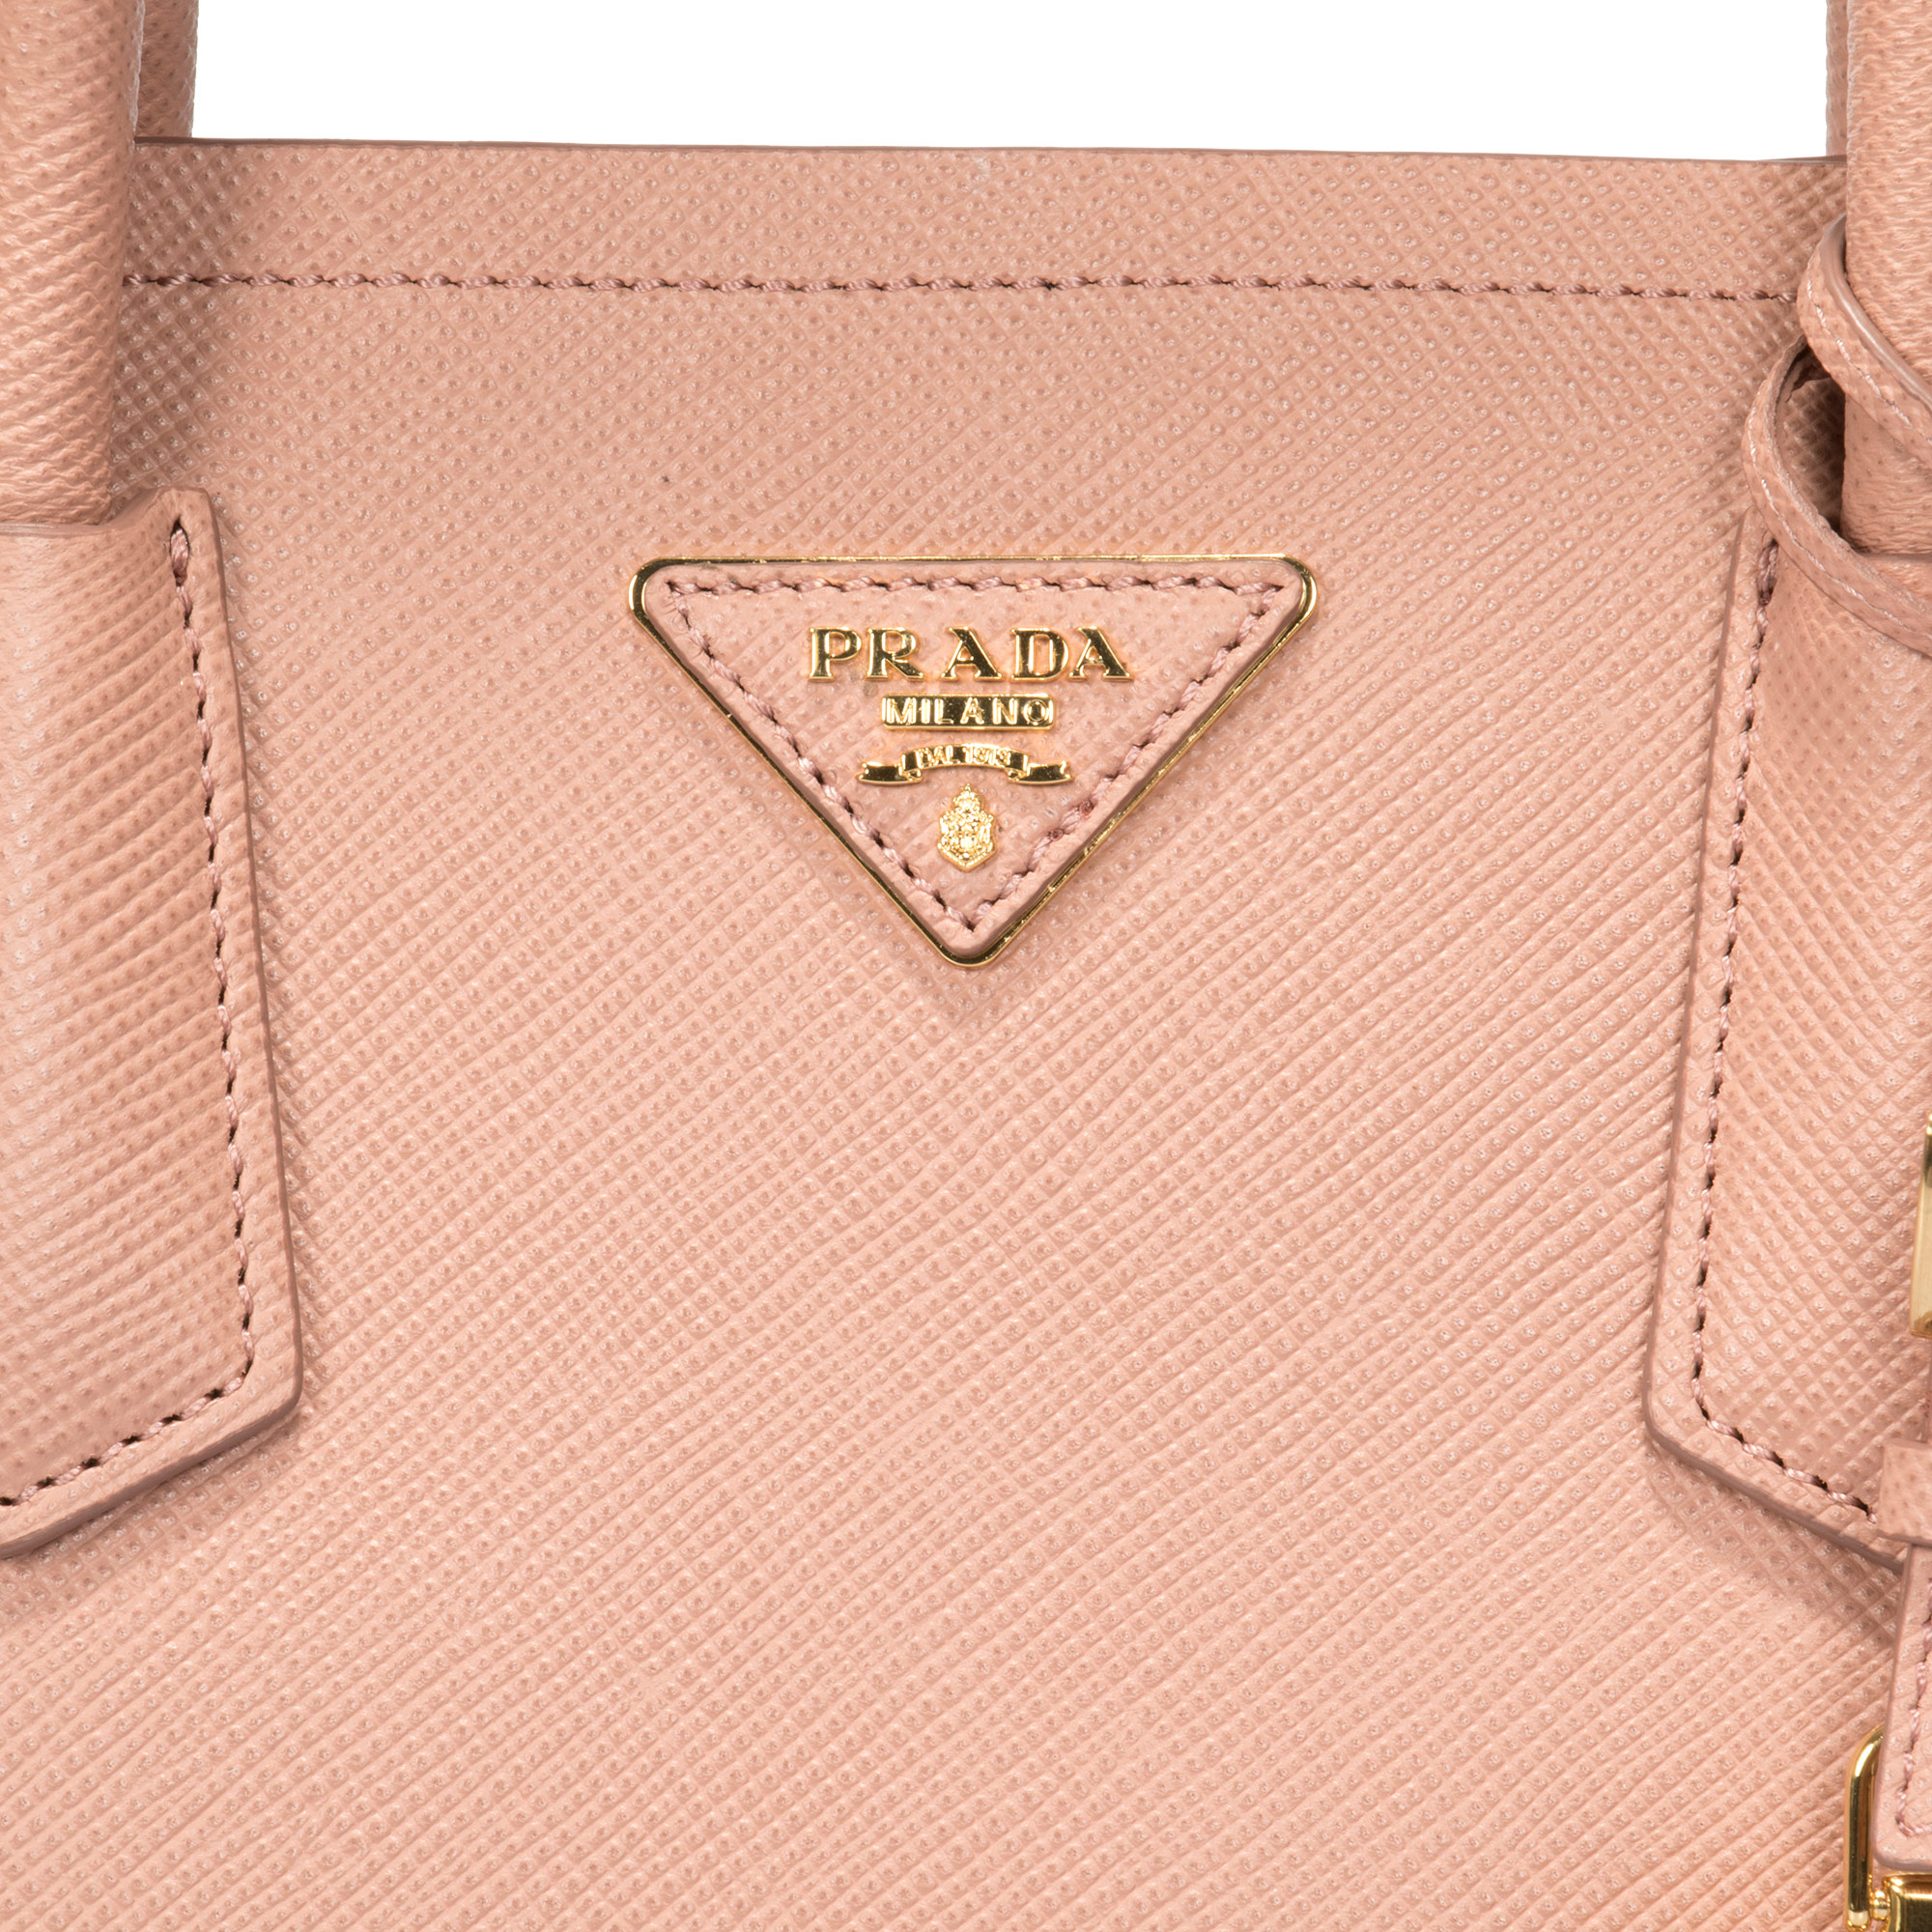 a25d71184e4e Prada - Prada Double Saffiano Leather Tote In Cammeo - Walmart.com